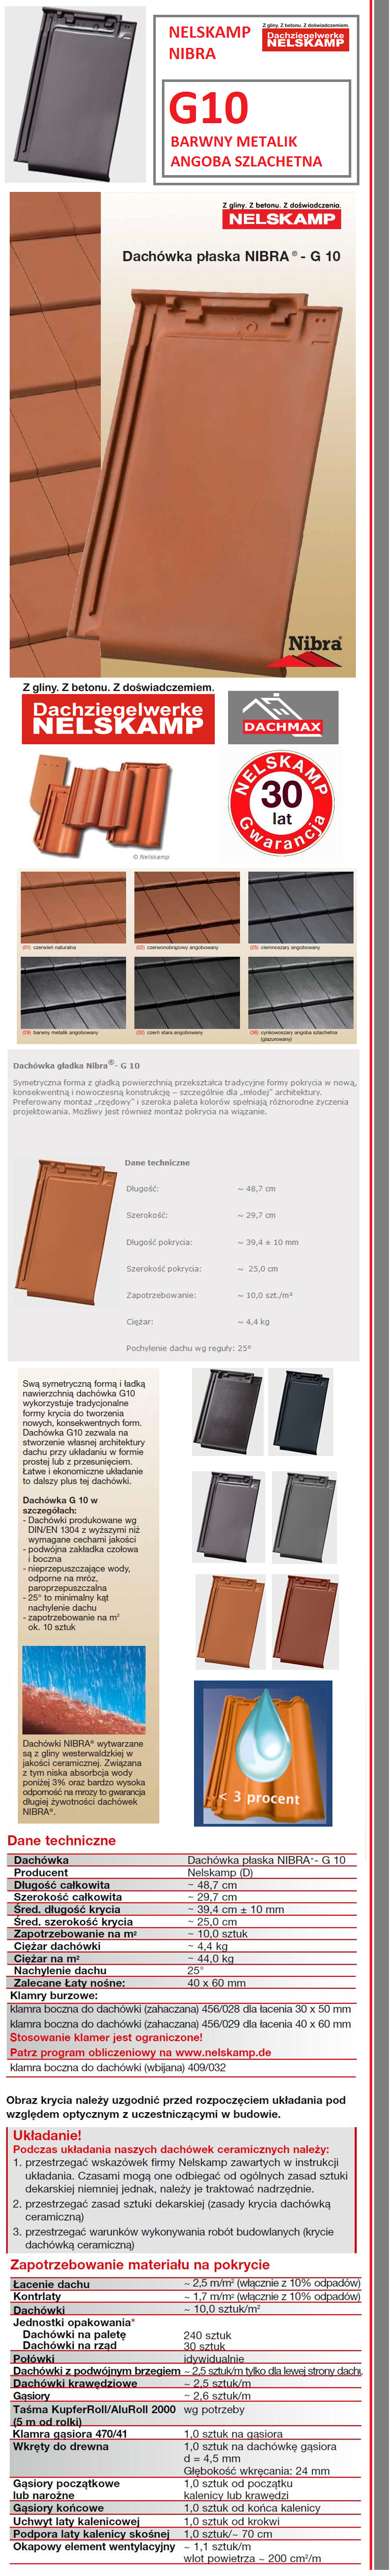 g10 dach wka nelskamp nibra barwny metalik angoba szlachetna. Black Bedroom Furniture Sets. Home Design Ideas